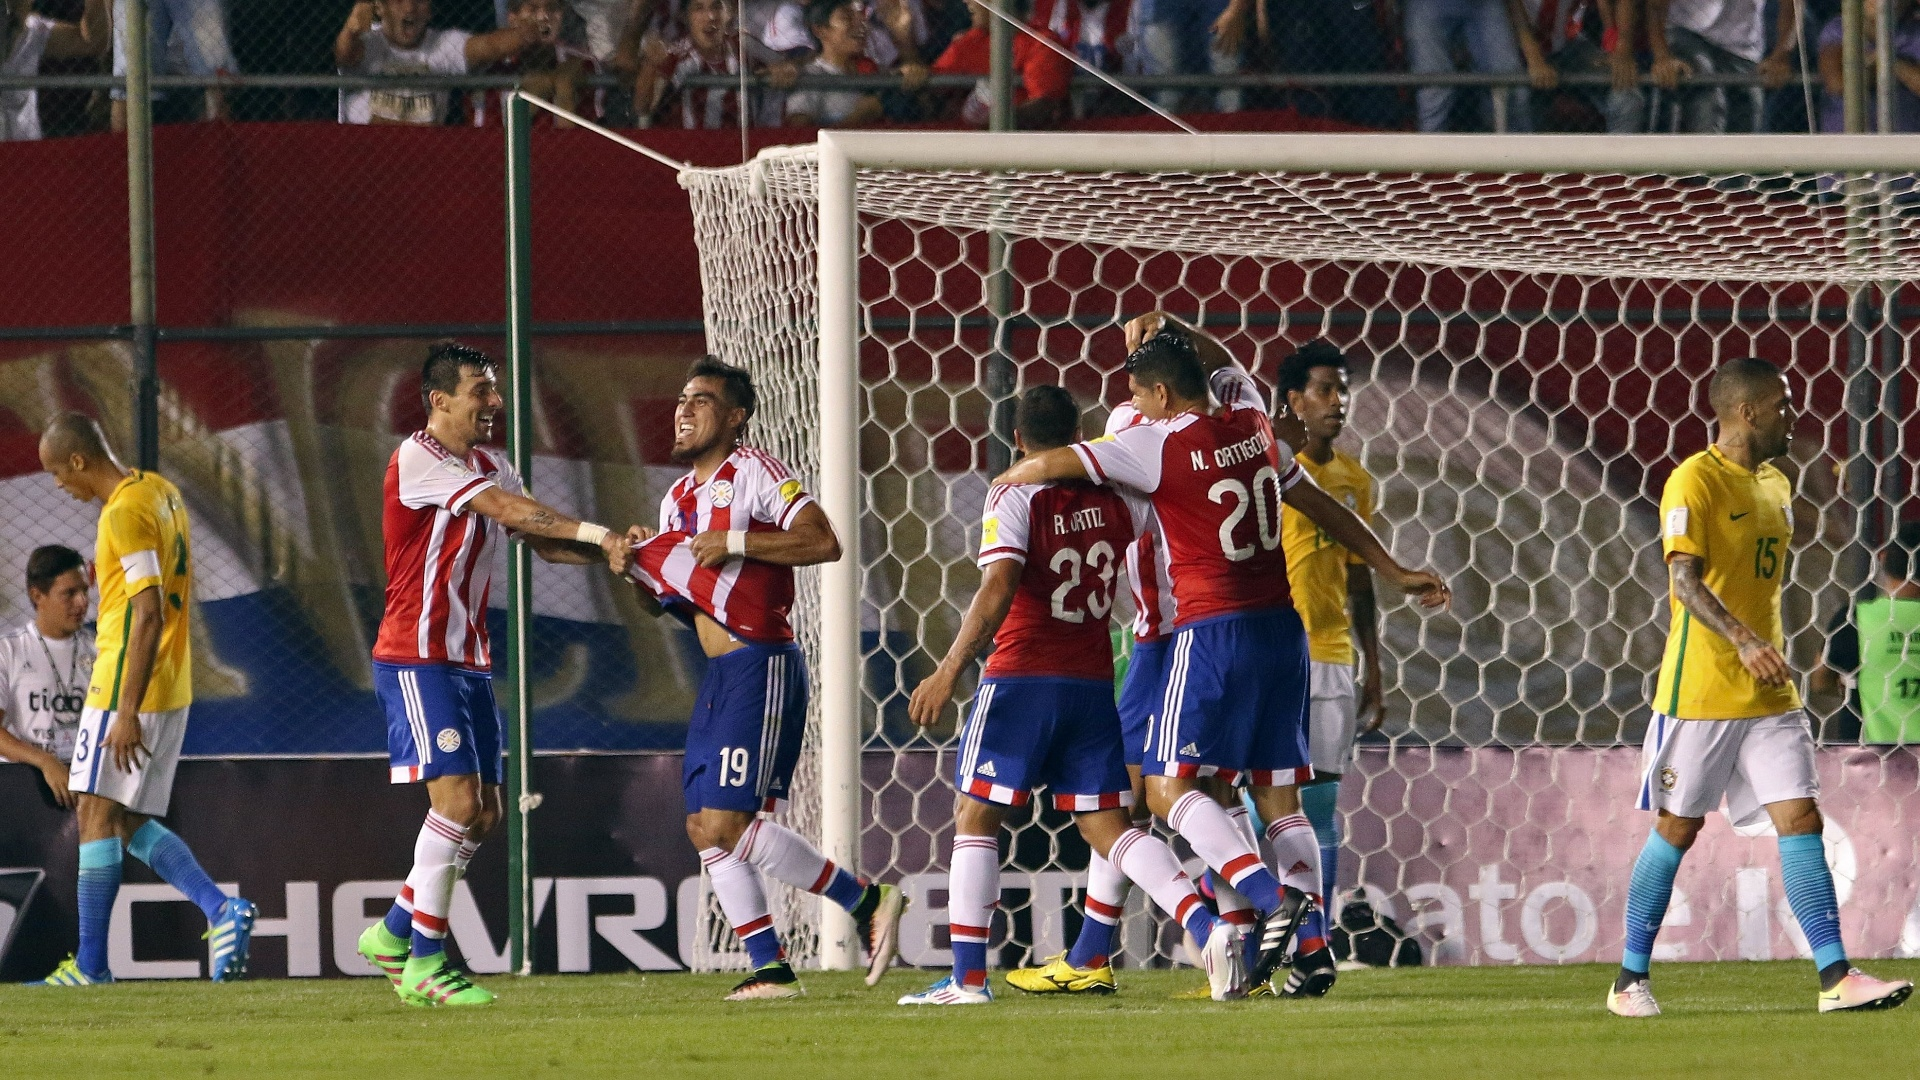 Paraguaios comemoram gol contra o Brasil marcado por Dario Lezcano